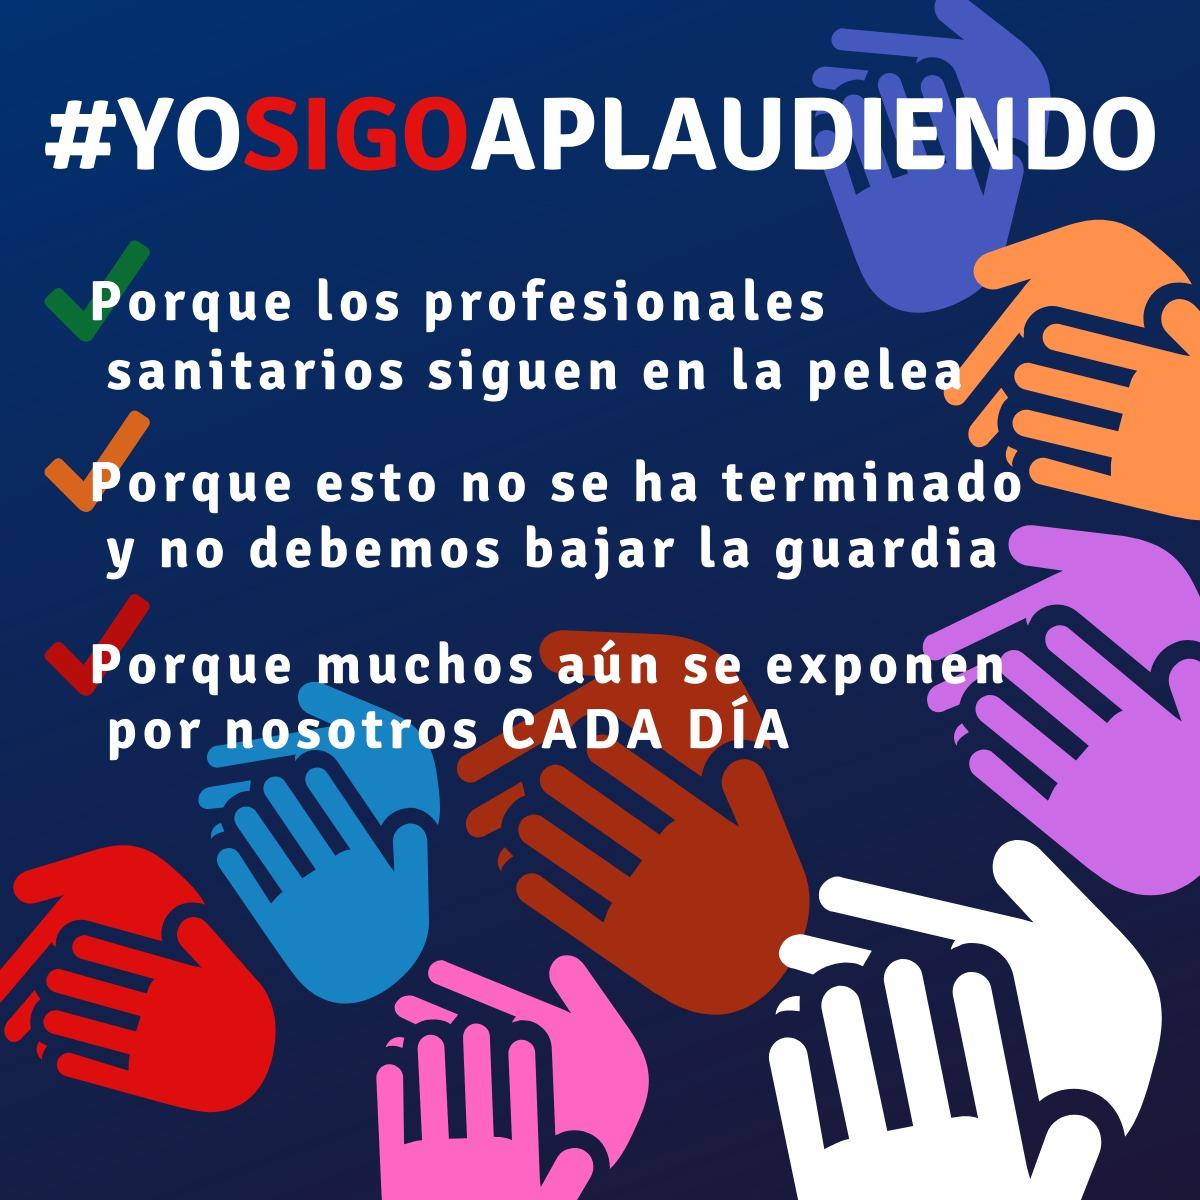 #yosigoaplaudiendo